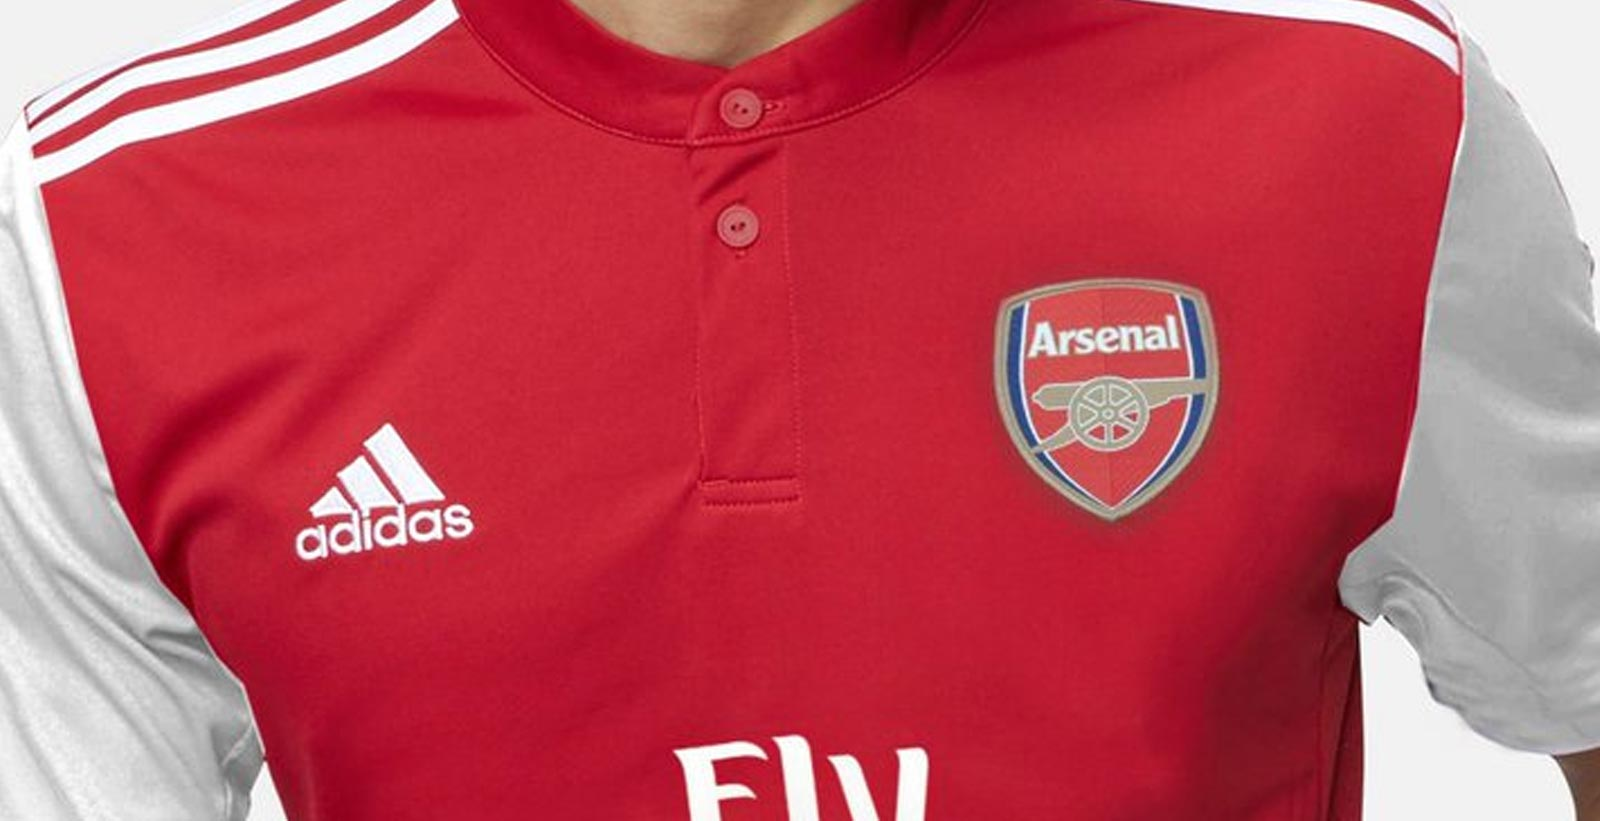 d33e067e9 It seems likely that the Three Stripes will make Arsenal s kits from next  season